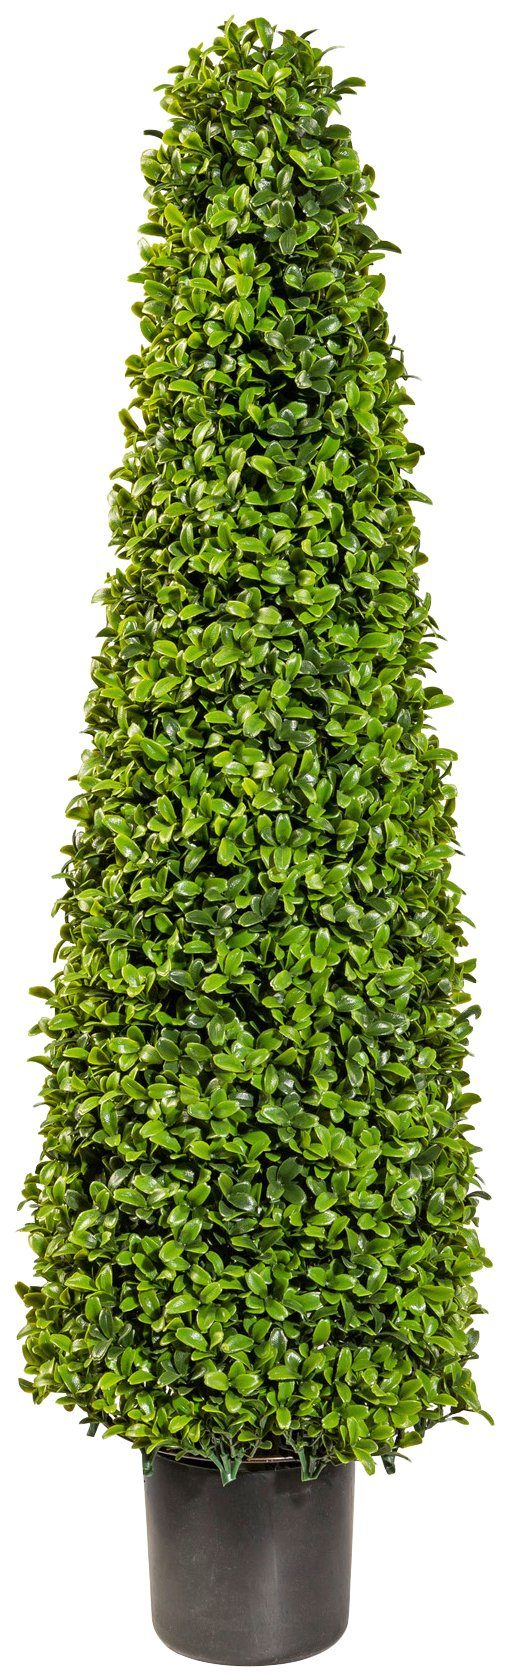 Kunstpflanze »Buchsbaum in Kegelform«, im Kunststofftopf, H: 90 cm